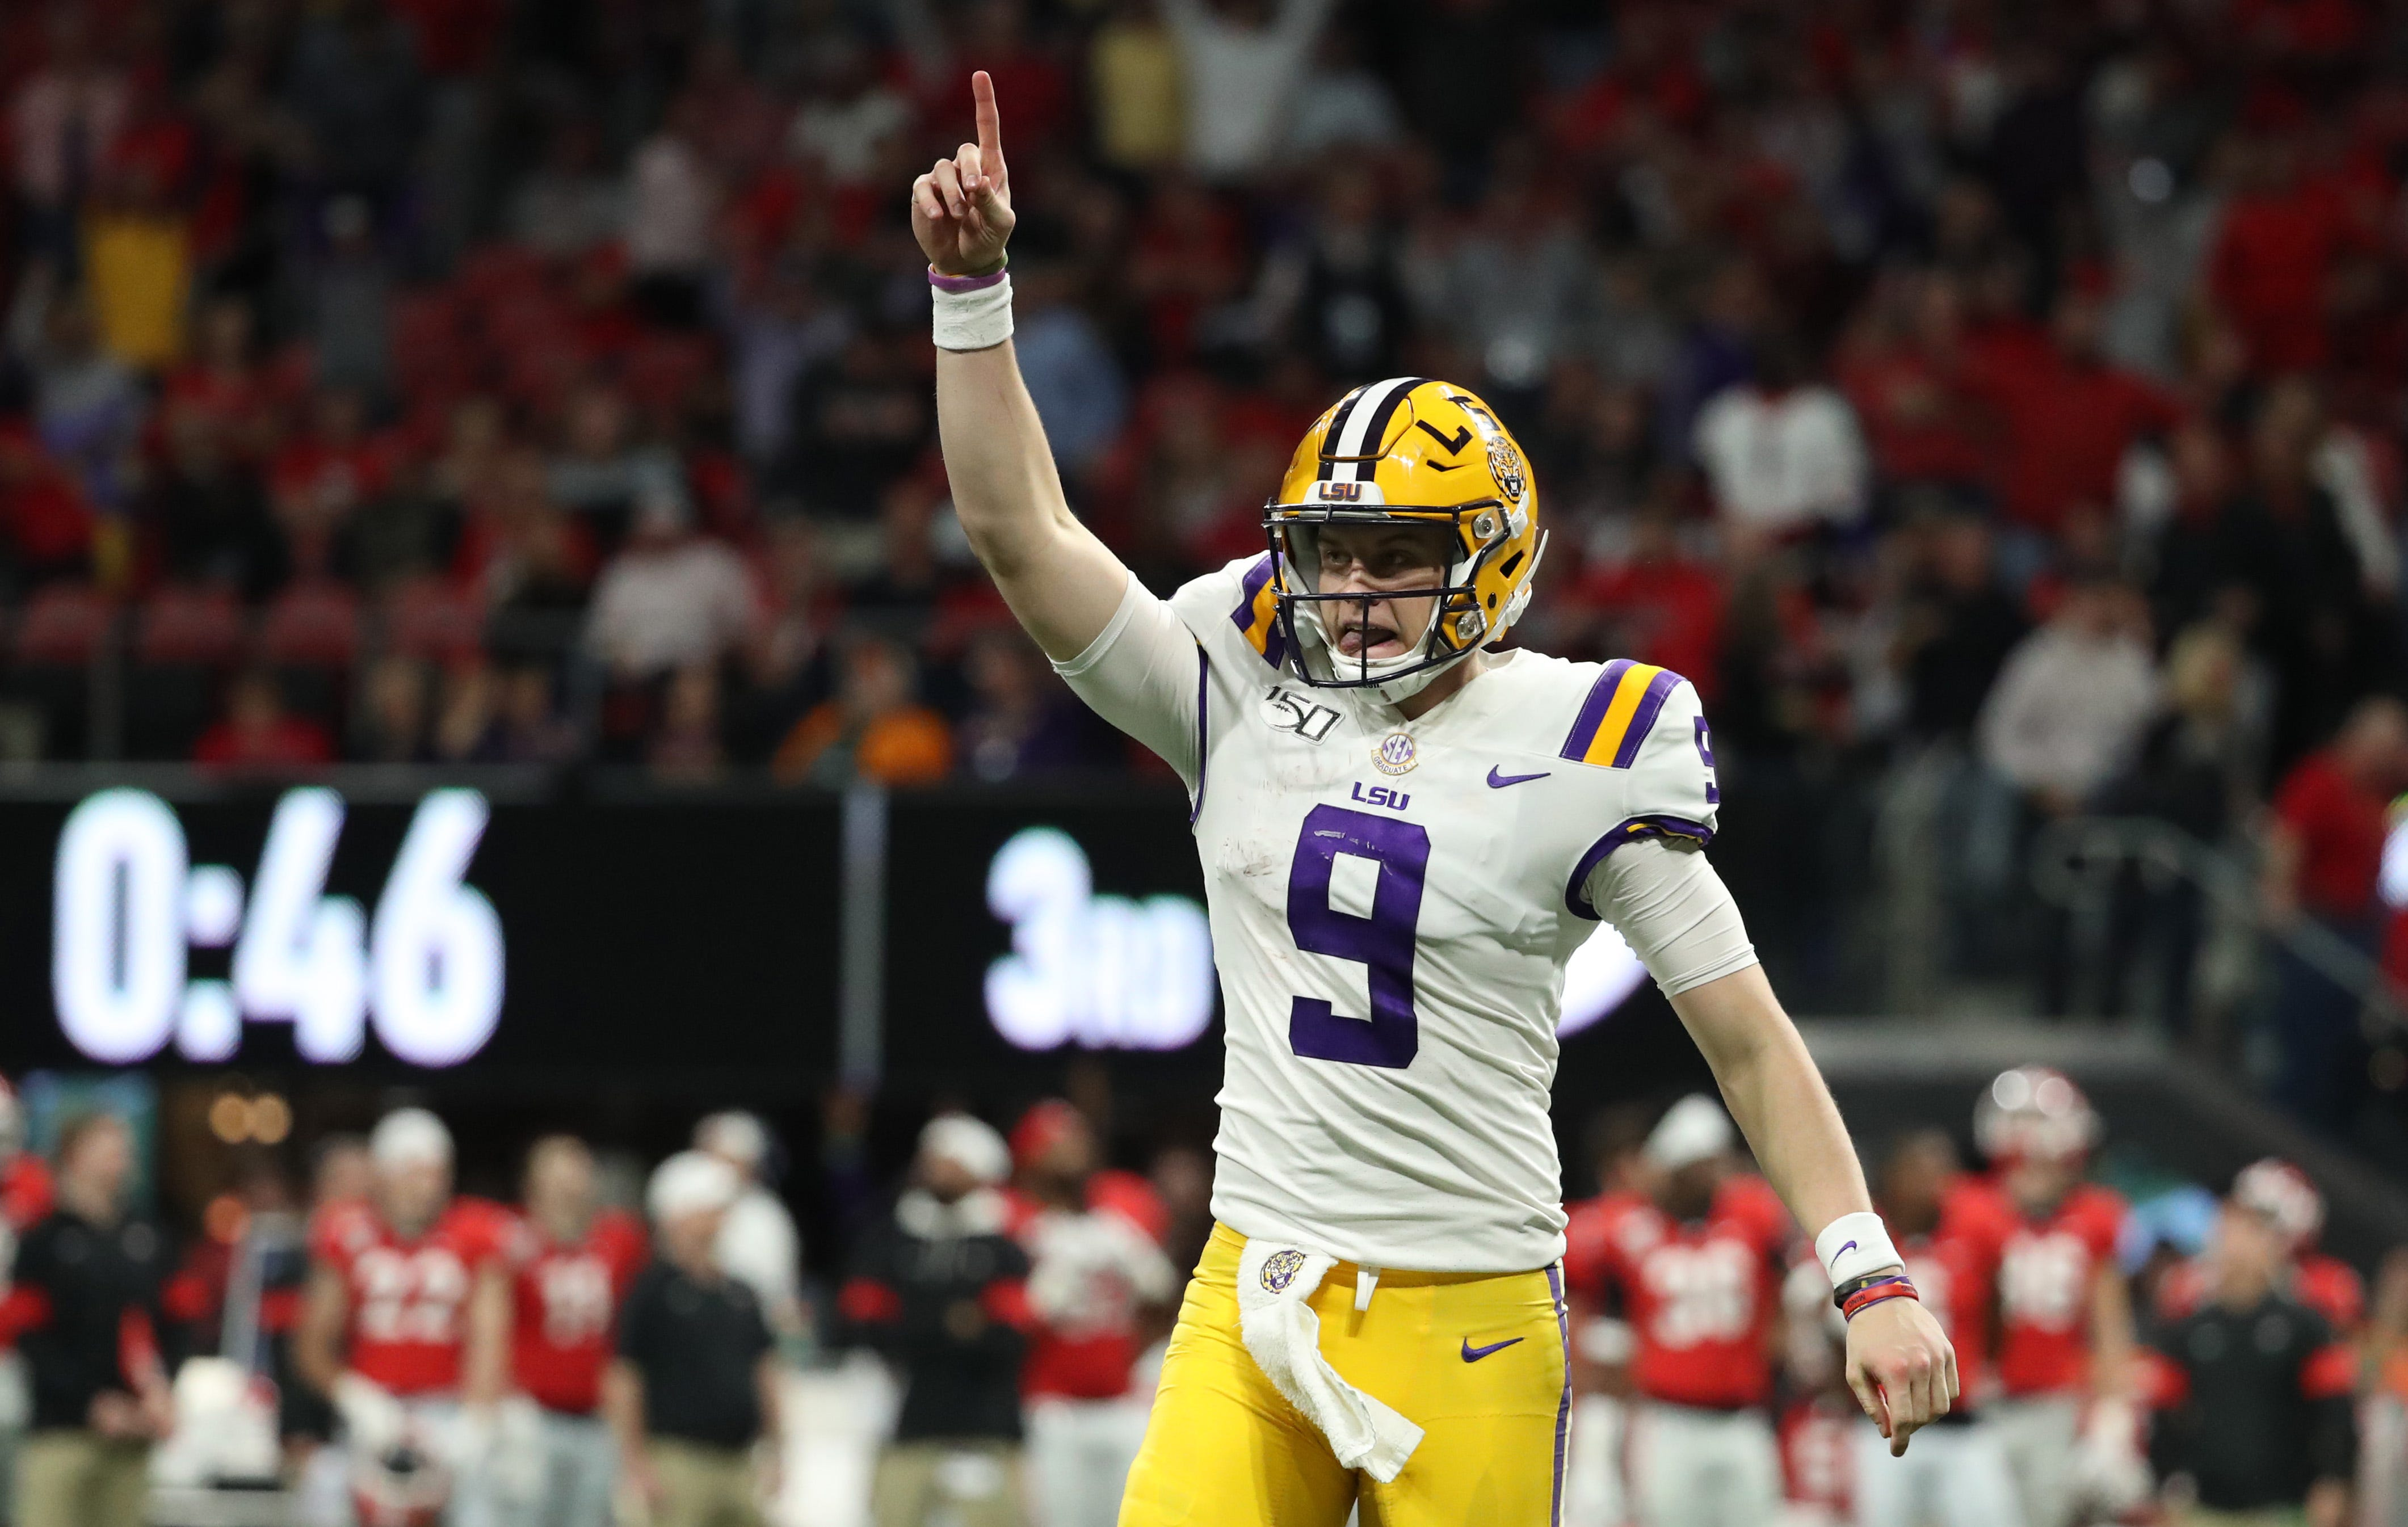 LSU quarterback Joe Burrow wins 2019 Heisman Trophy by overwhelming margin